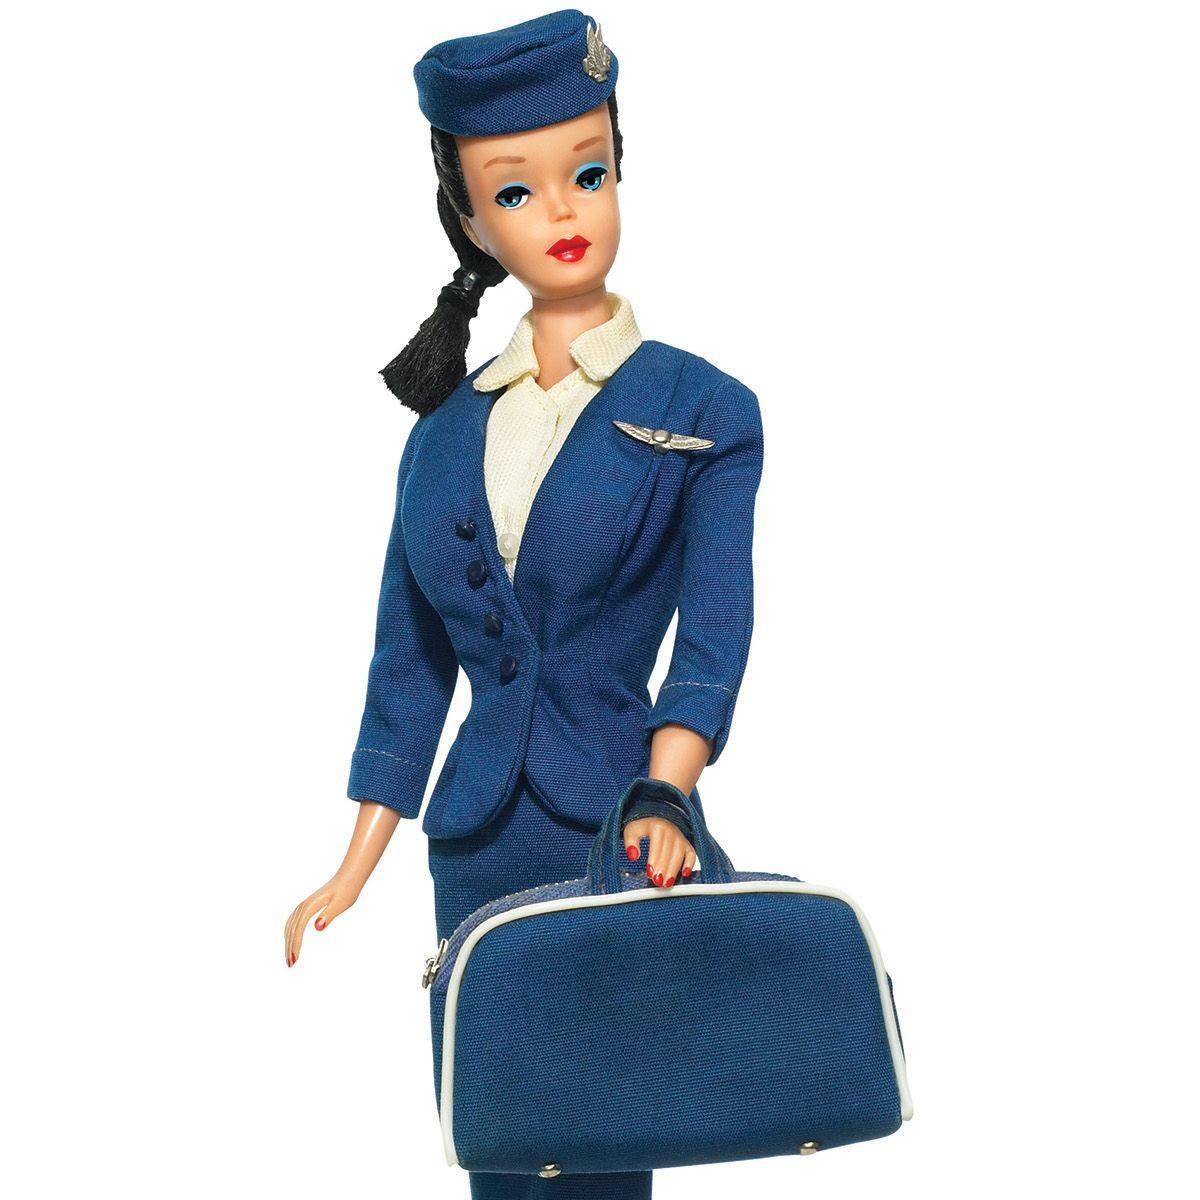 <p>Barbie flight attendant</p>